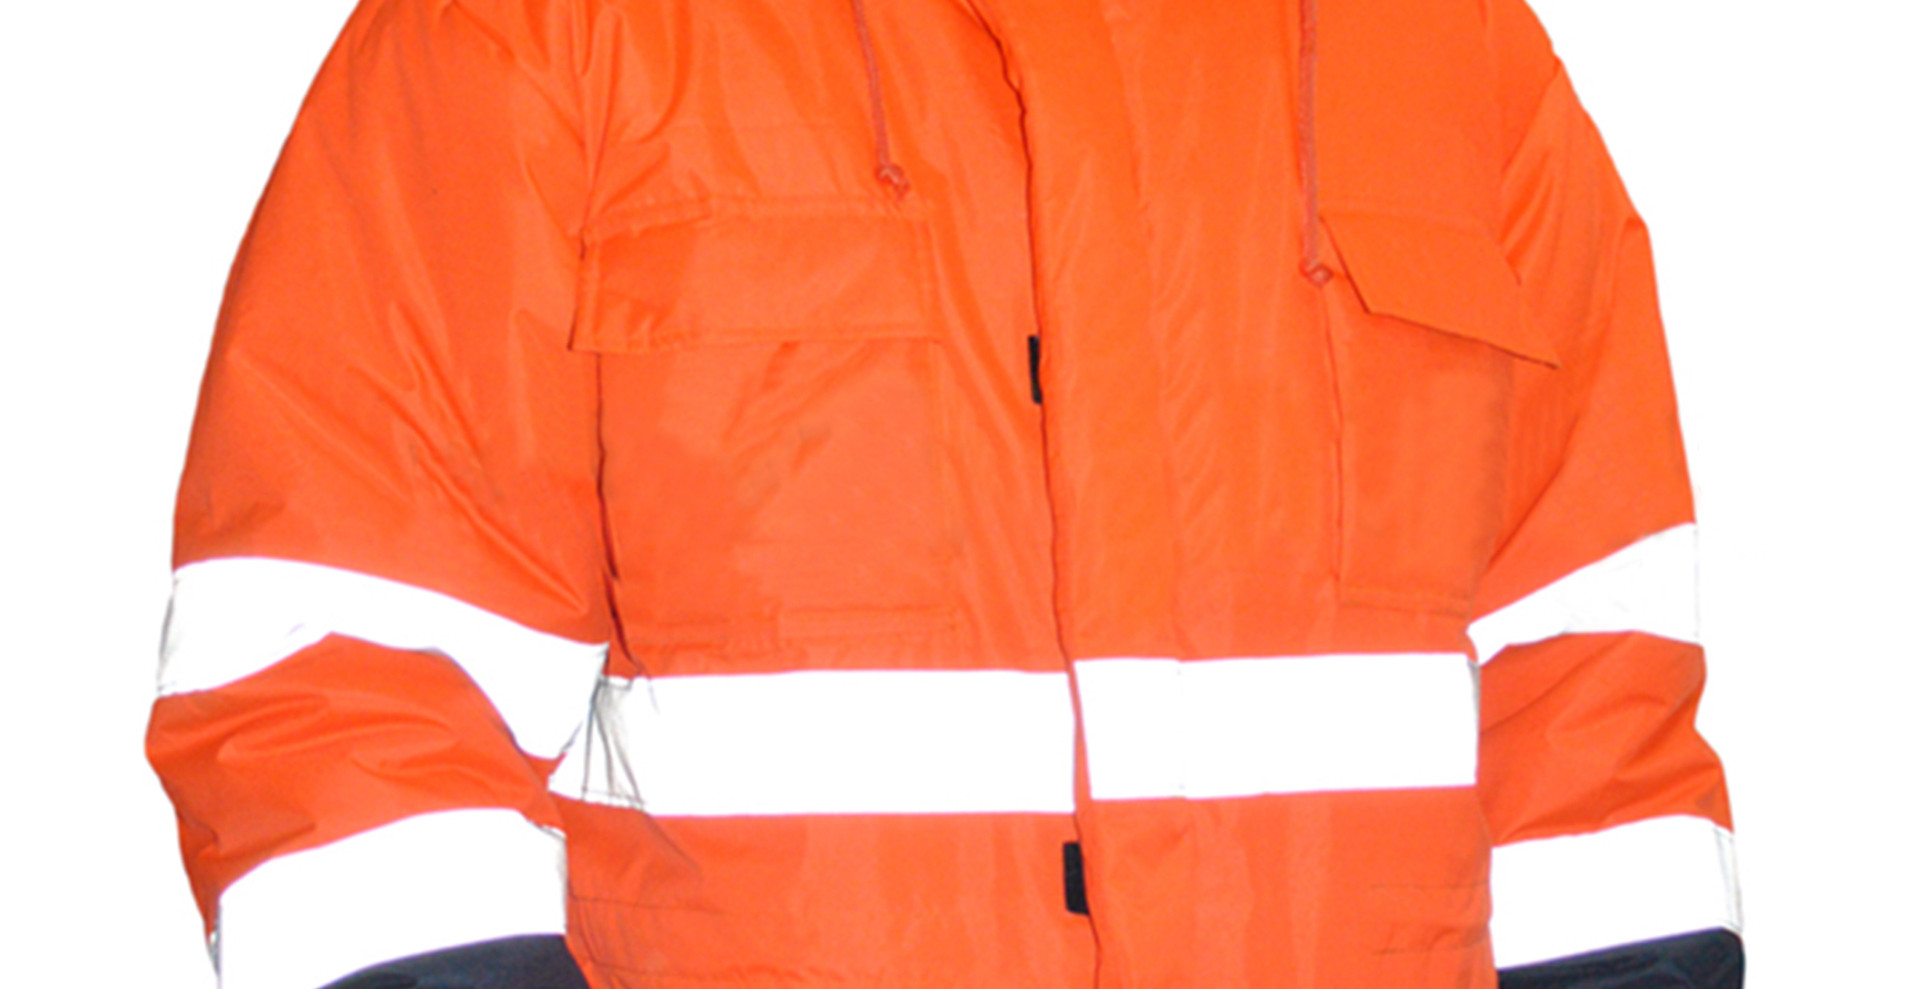 Neon Orange Parka Jacket